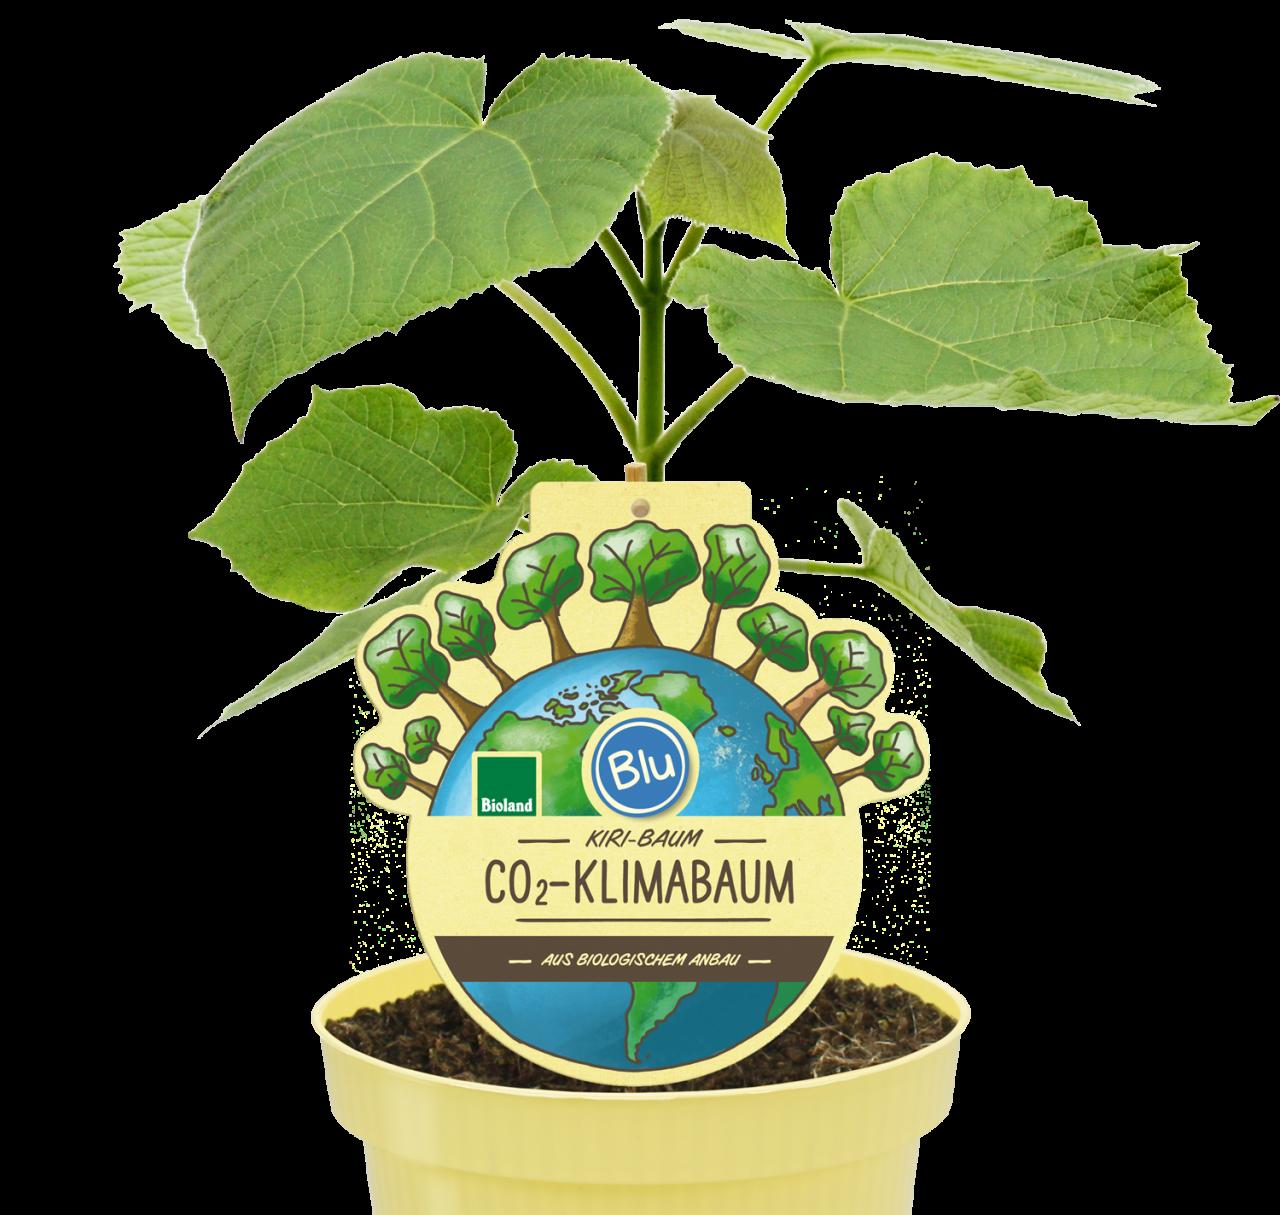 Blu - KIRI-BAUM CO<sub>2</sub>-Klimabaum